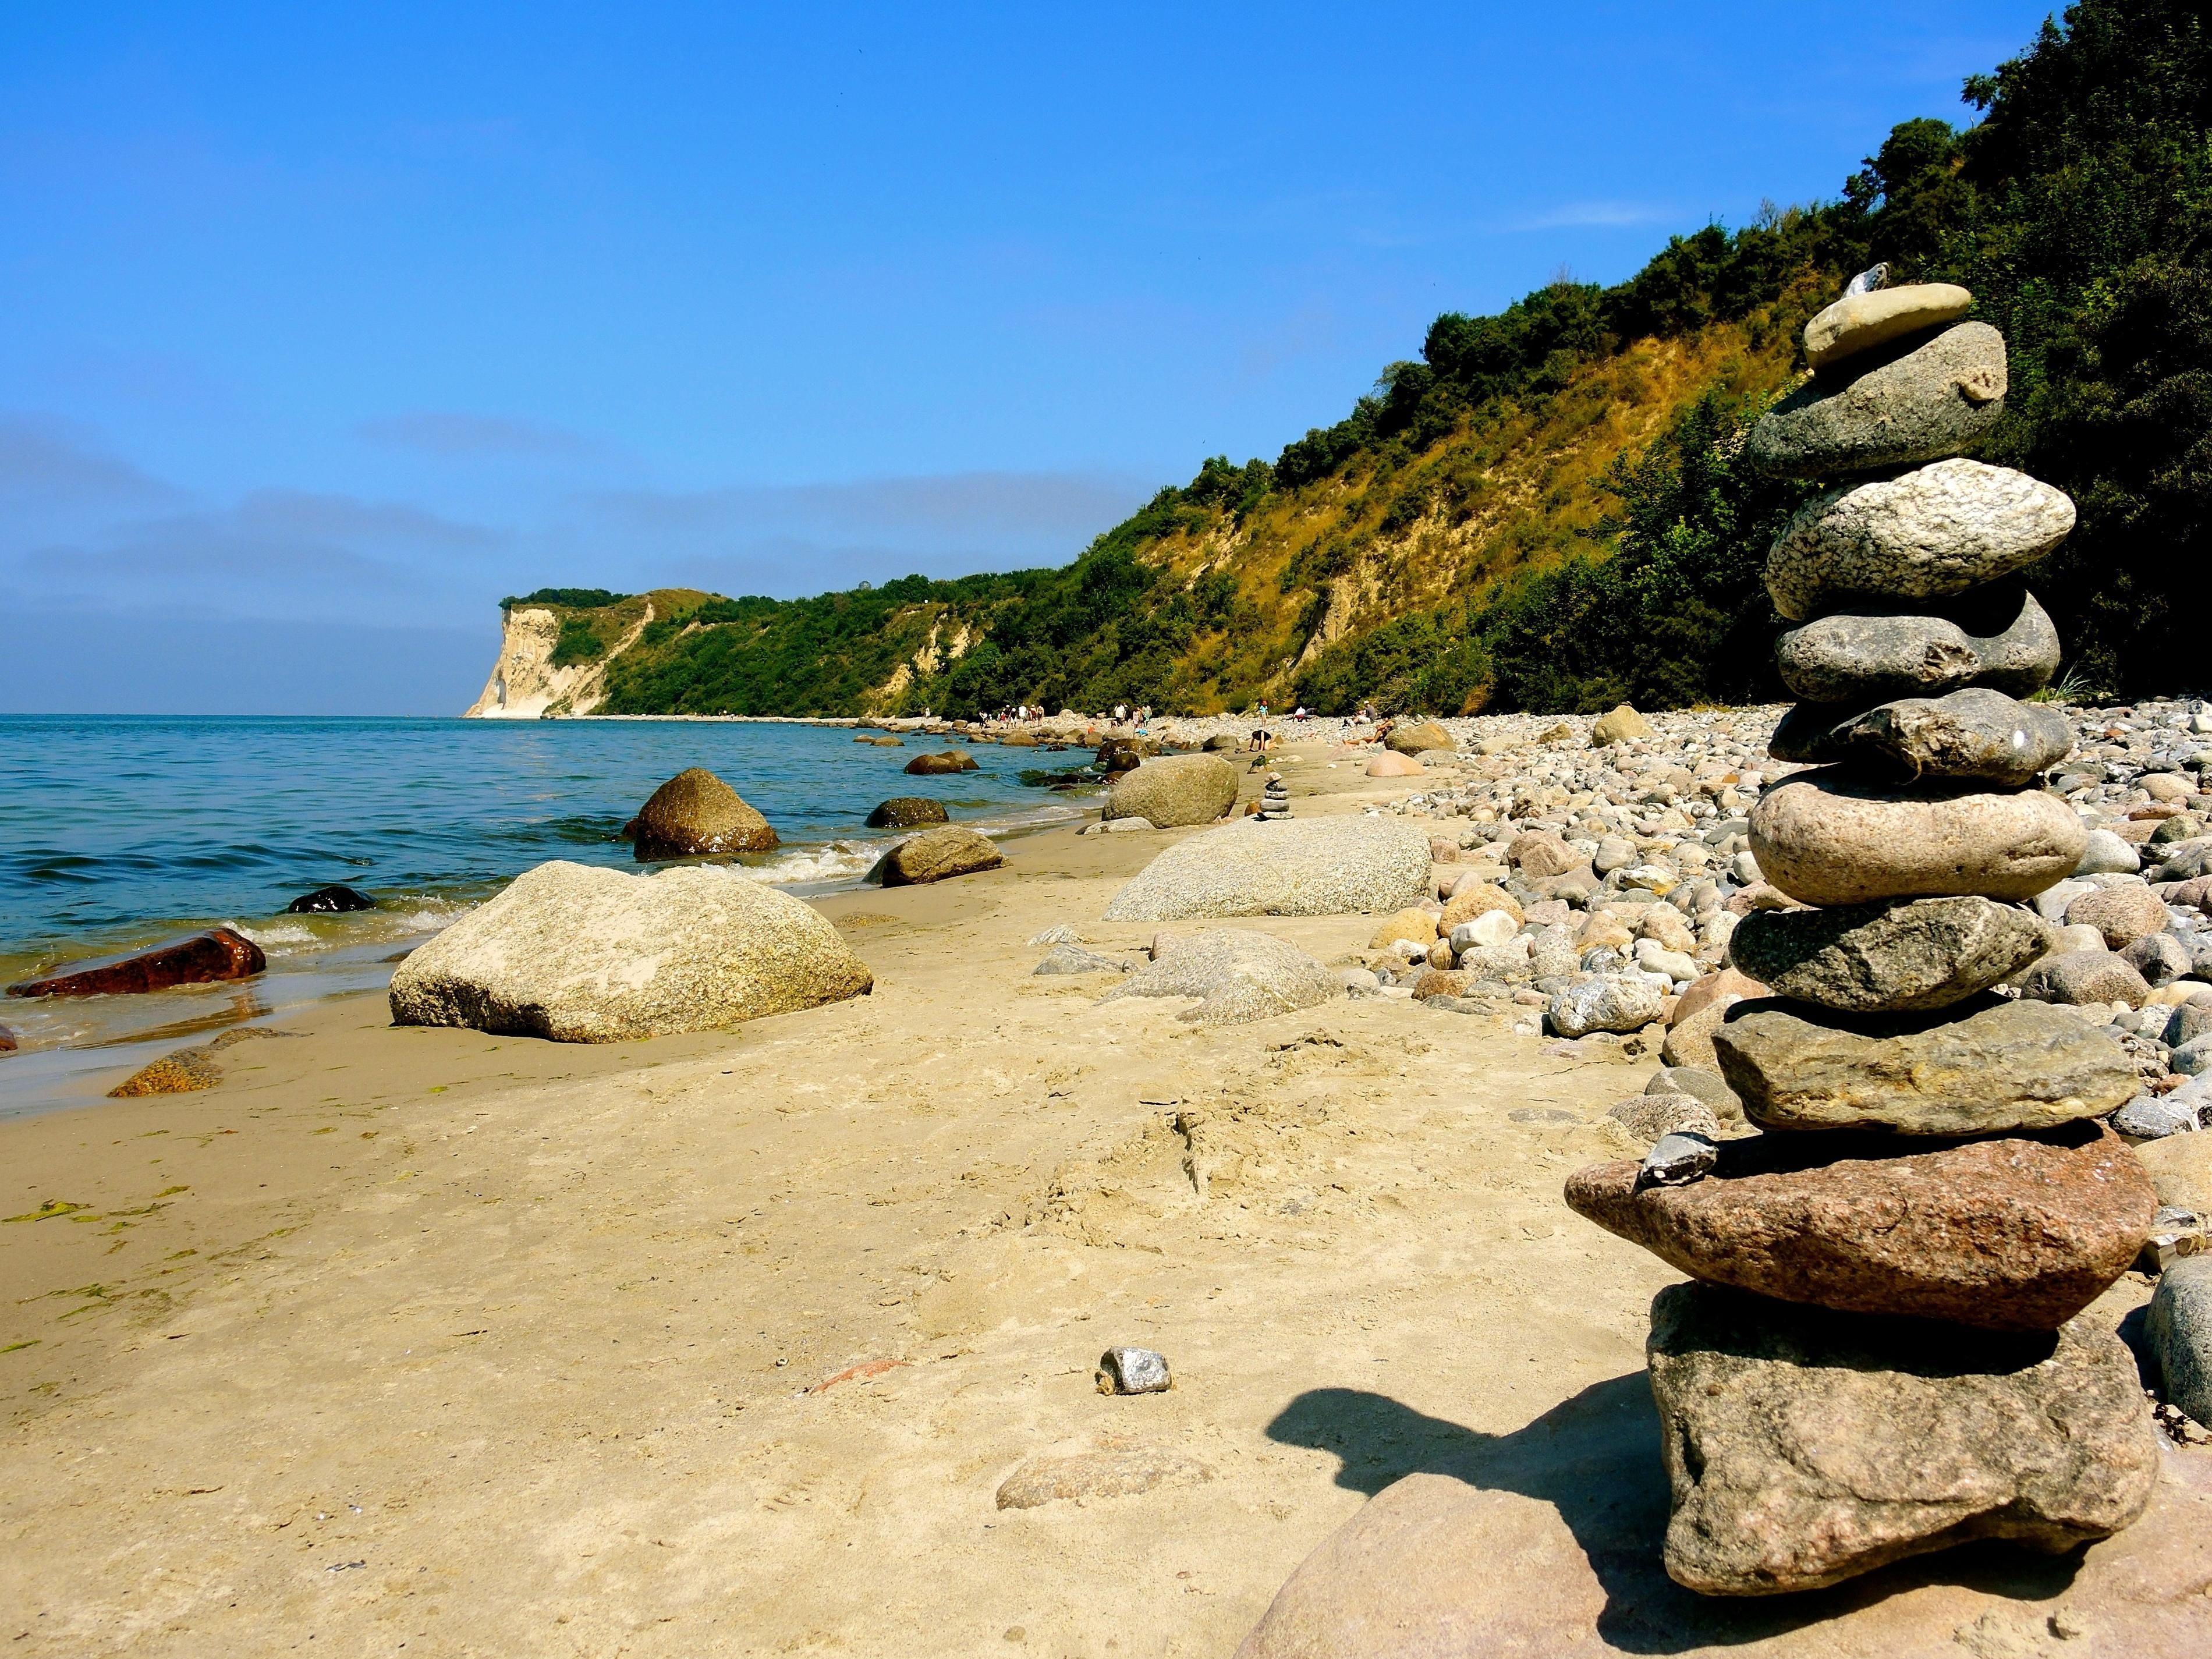 Landscape Wallpaper Hd Imagen Gratis Playa Agua Mar Litoral Piedra Roca